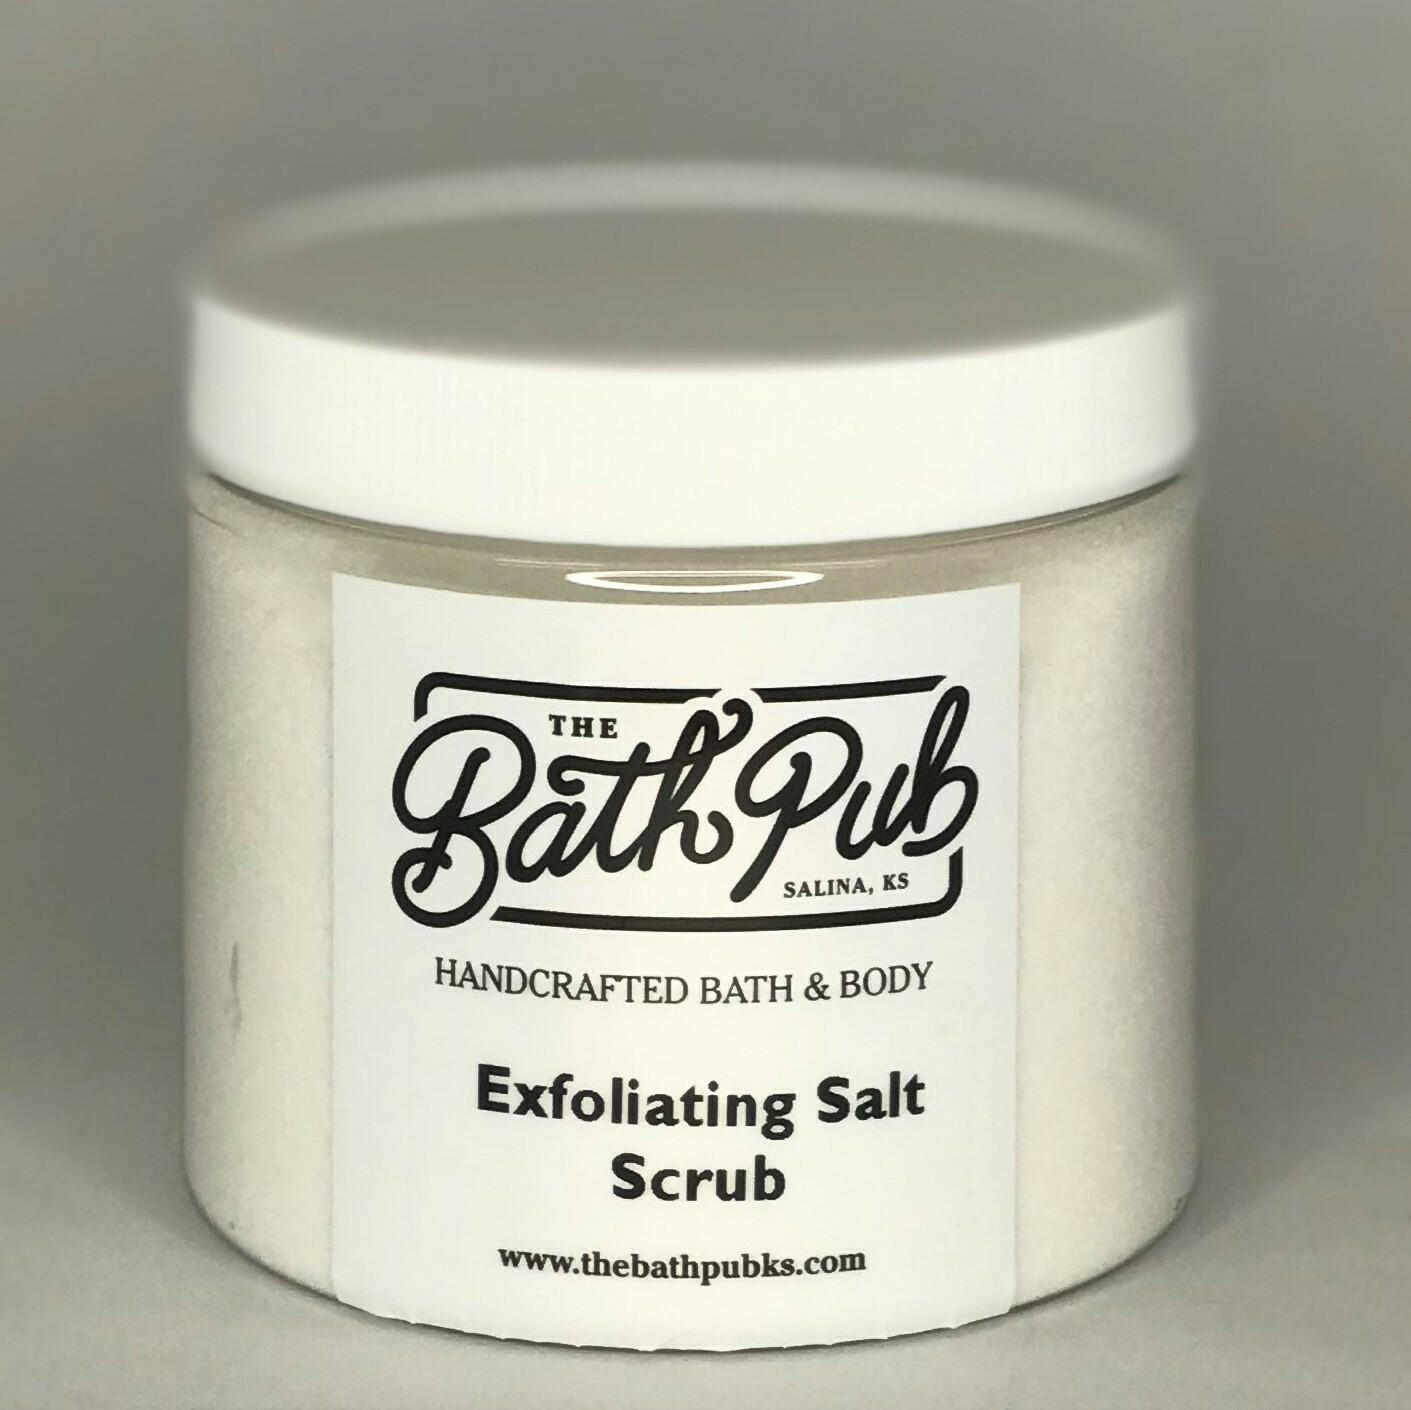 EXFOLIATING SALT SCRUB